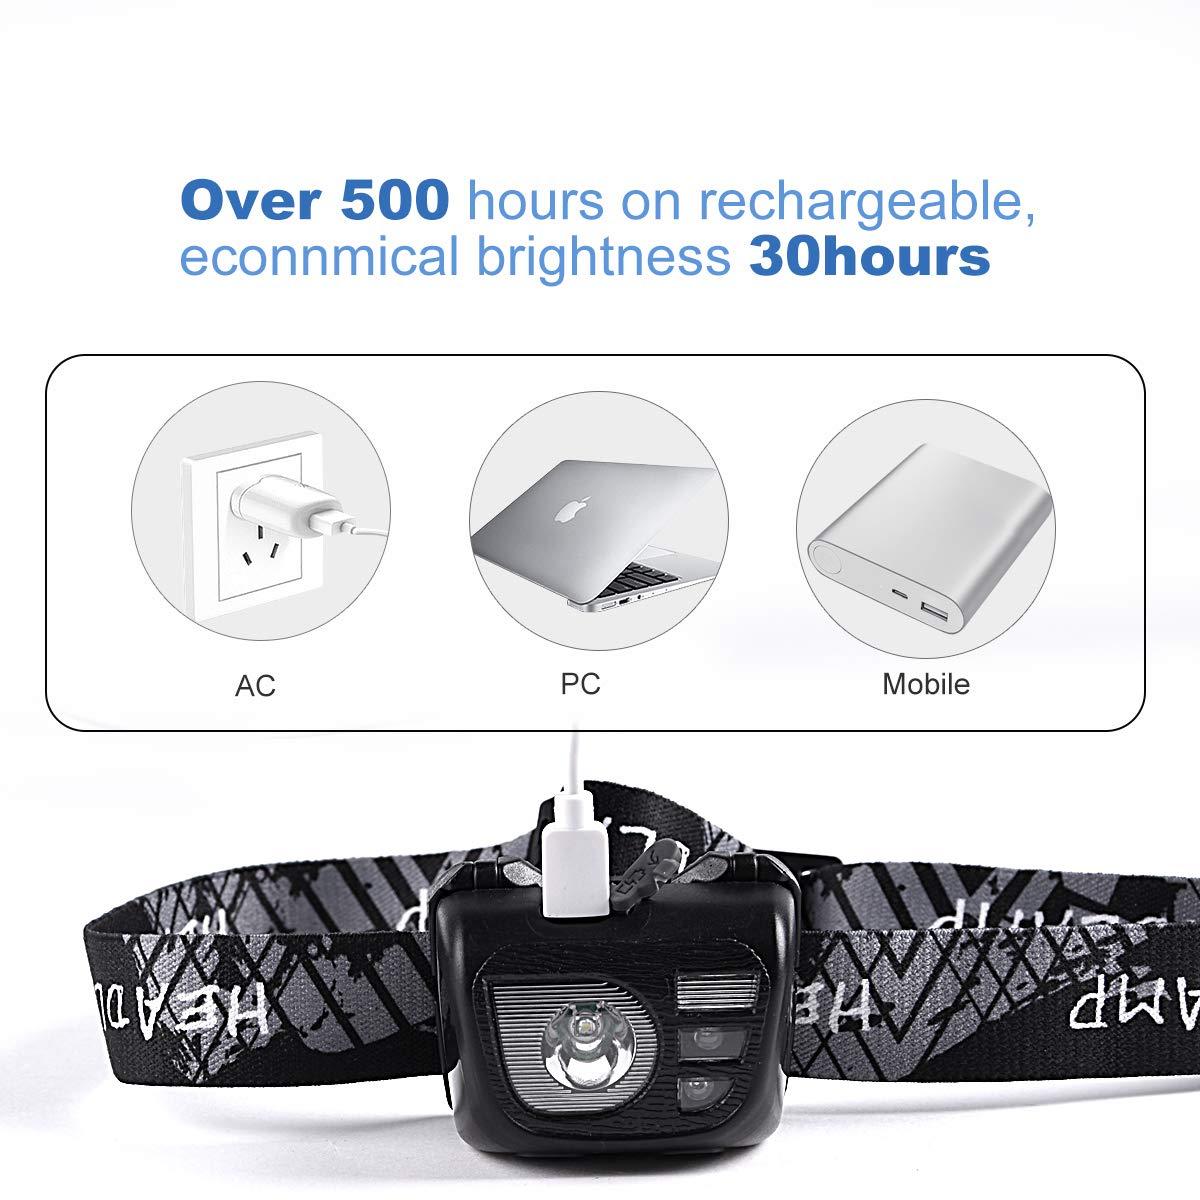 sunvito Linterna Frontal LED USB Recargable Super Bright Headlights 300 L/úmenes Correr Waterproof Hard Hat Ligh Ideal para Acampar Caminar y Leer